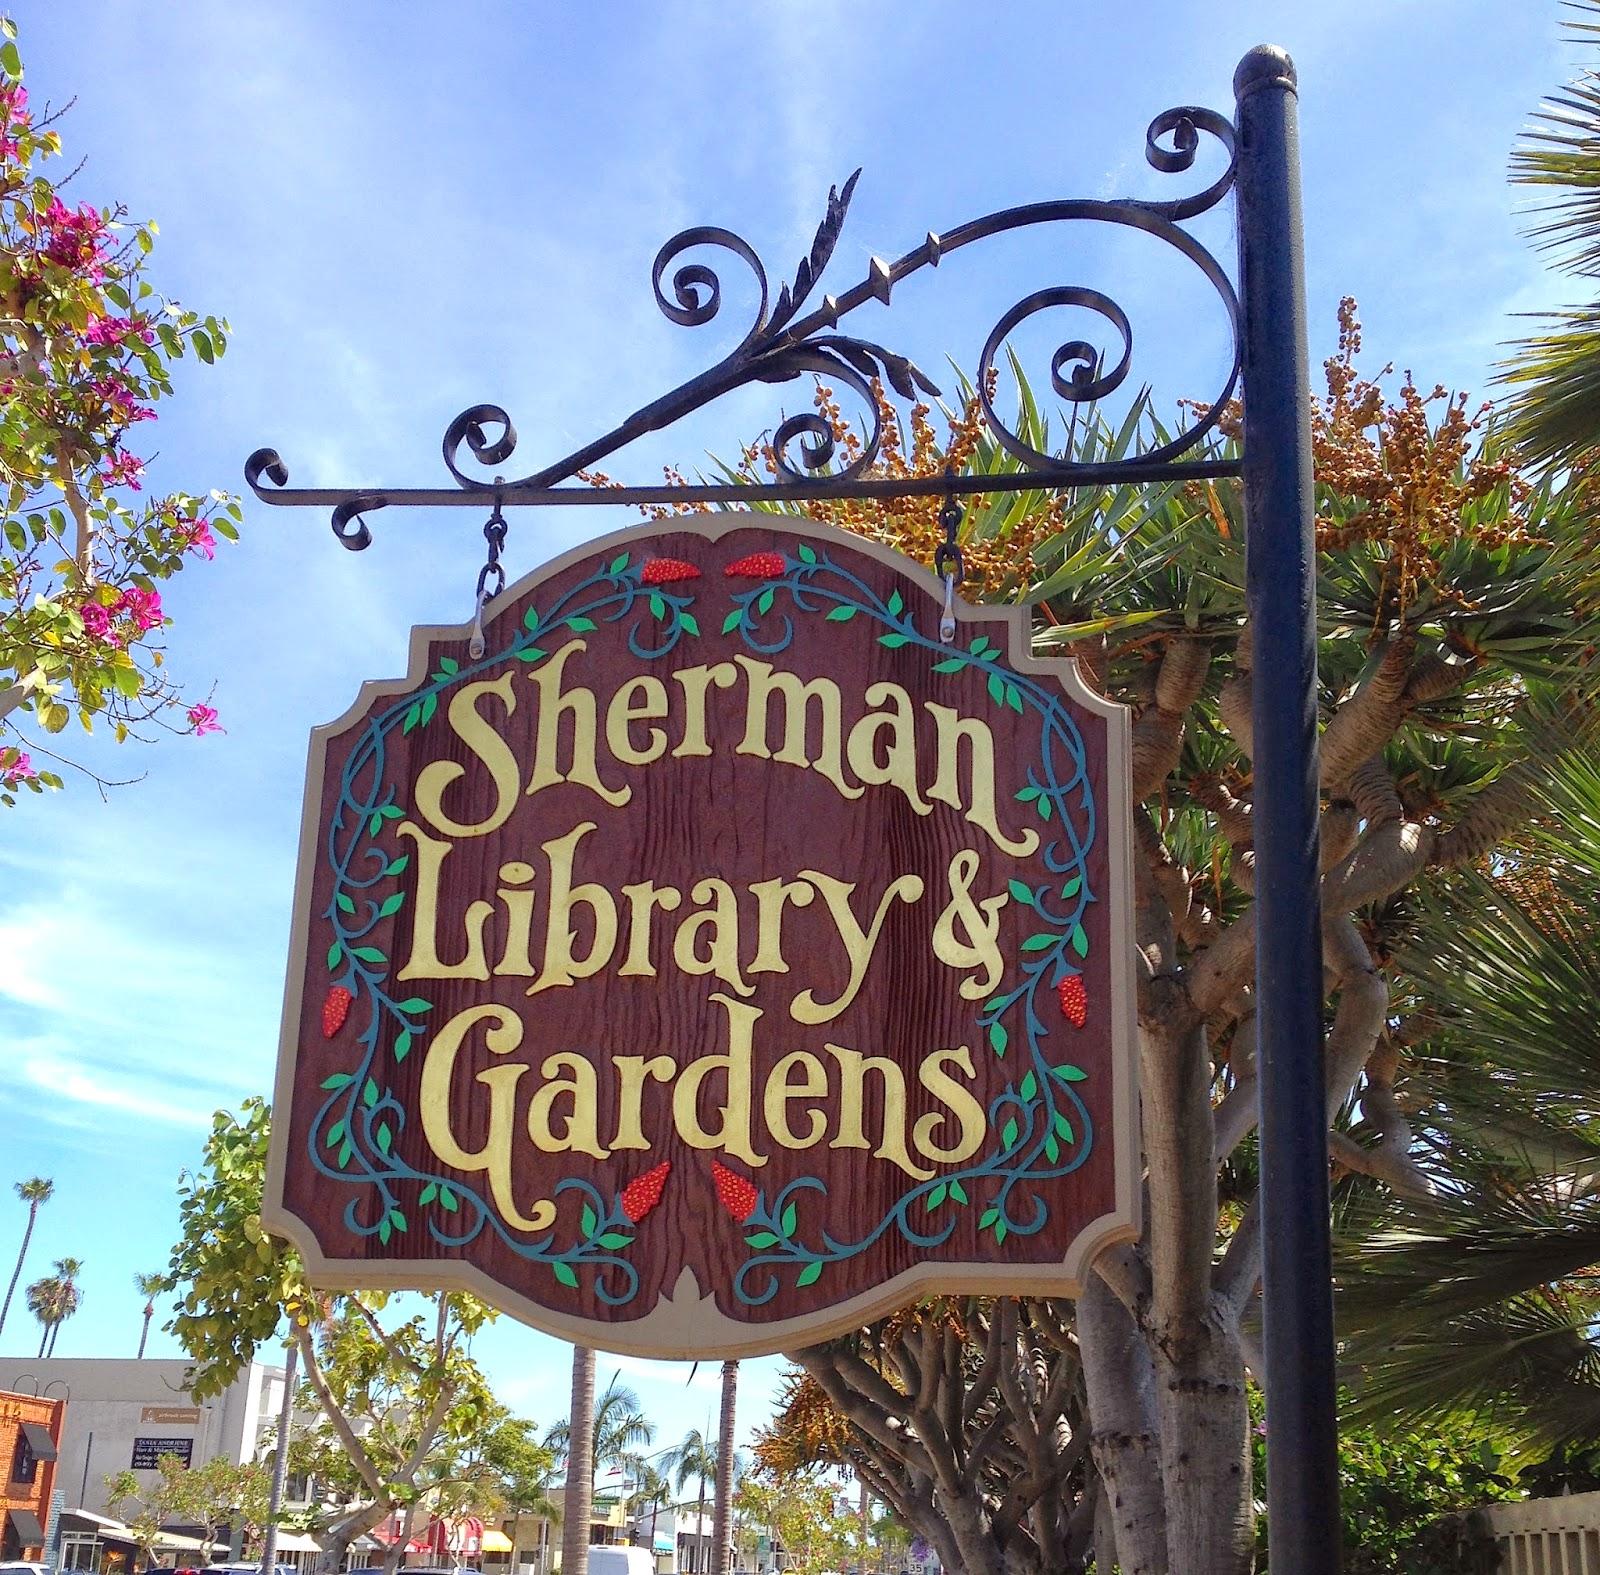 Cafe Jardin At Sherman Gardens Restaurant: The Joy Of Tea